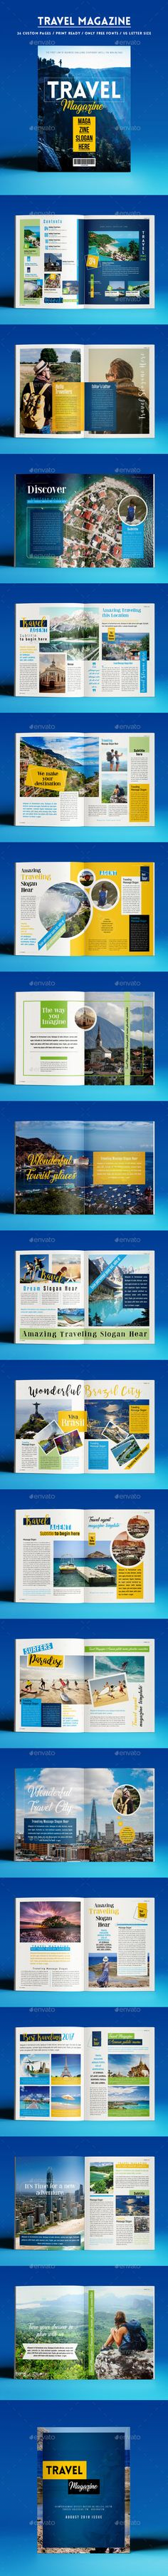 Travel Magazine — InDesign INDD #travel #album • Available here ➝ https://graphicriver.net/item/travel-magazine/20542190?ref=pxcr